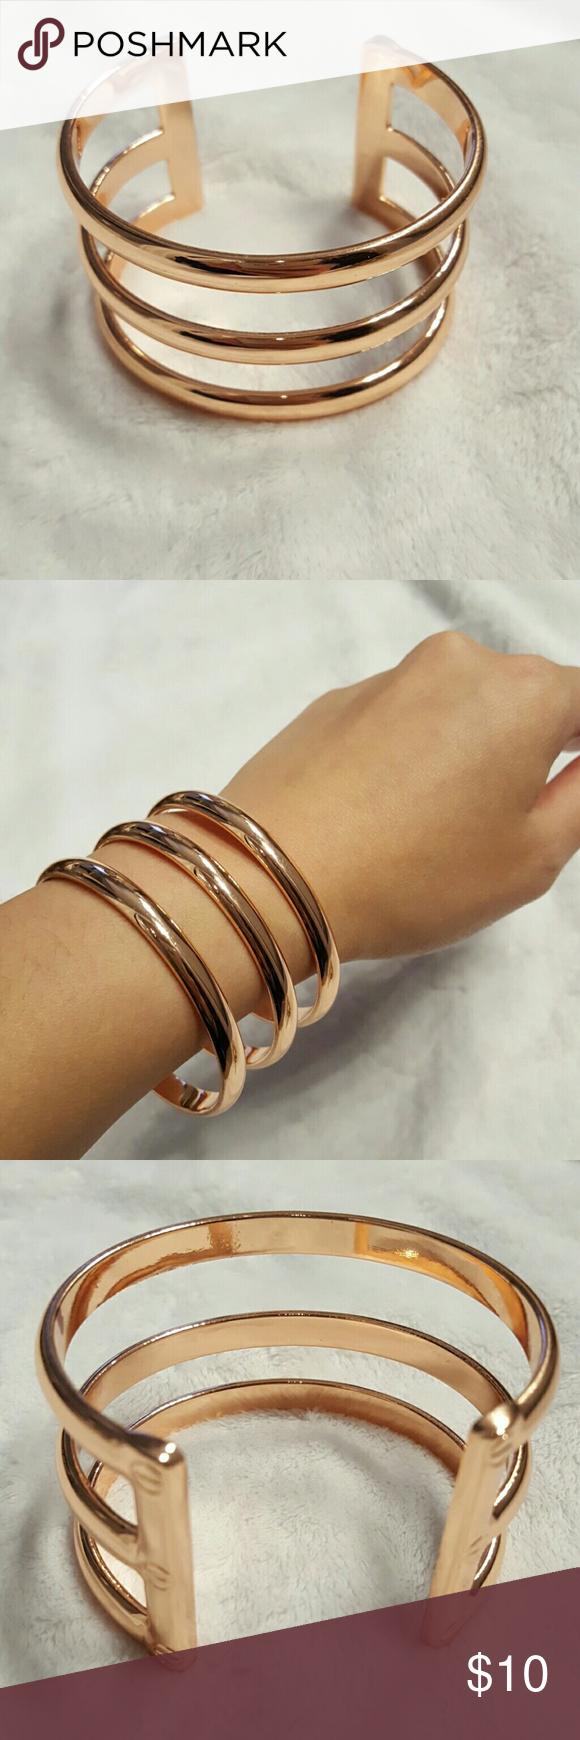 Rose gold costume jewelry Costume jewelry Jewellery bracelets and